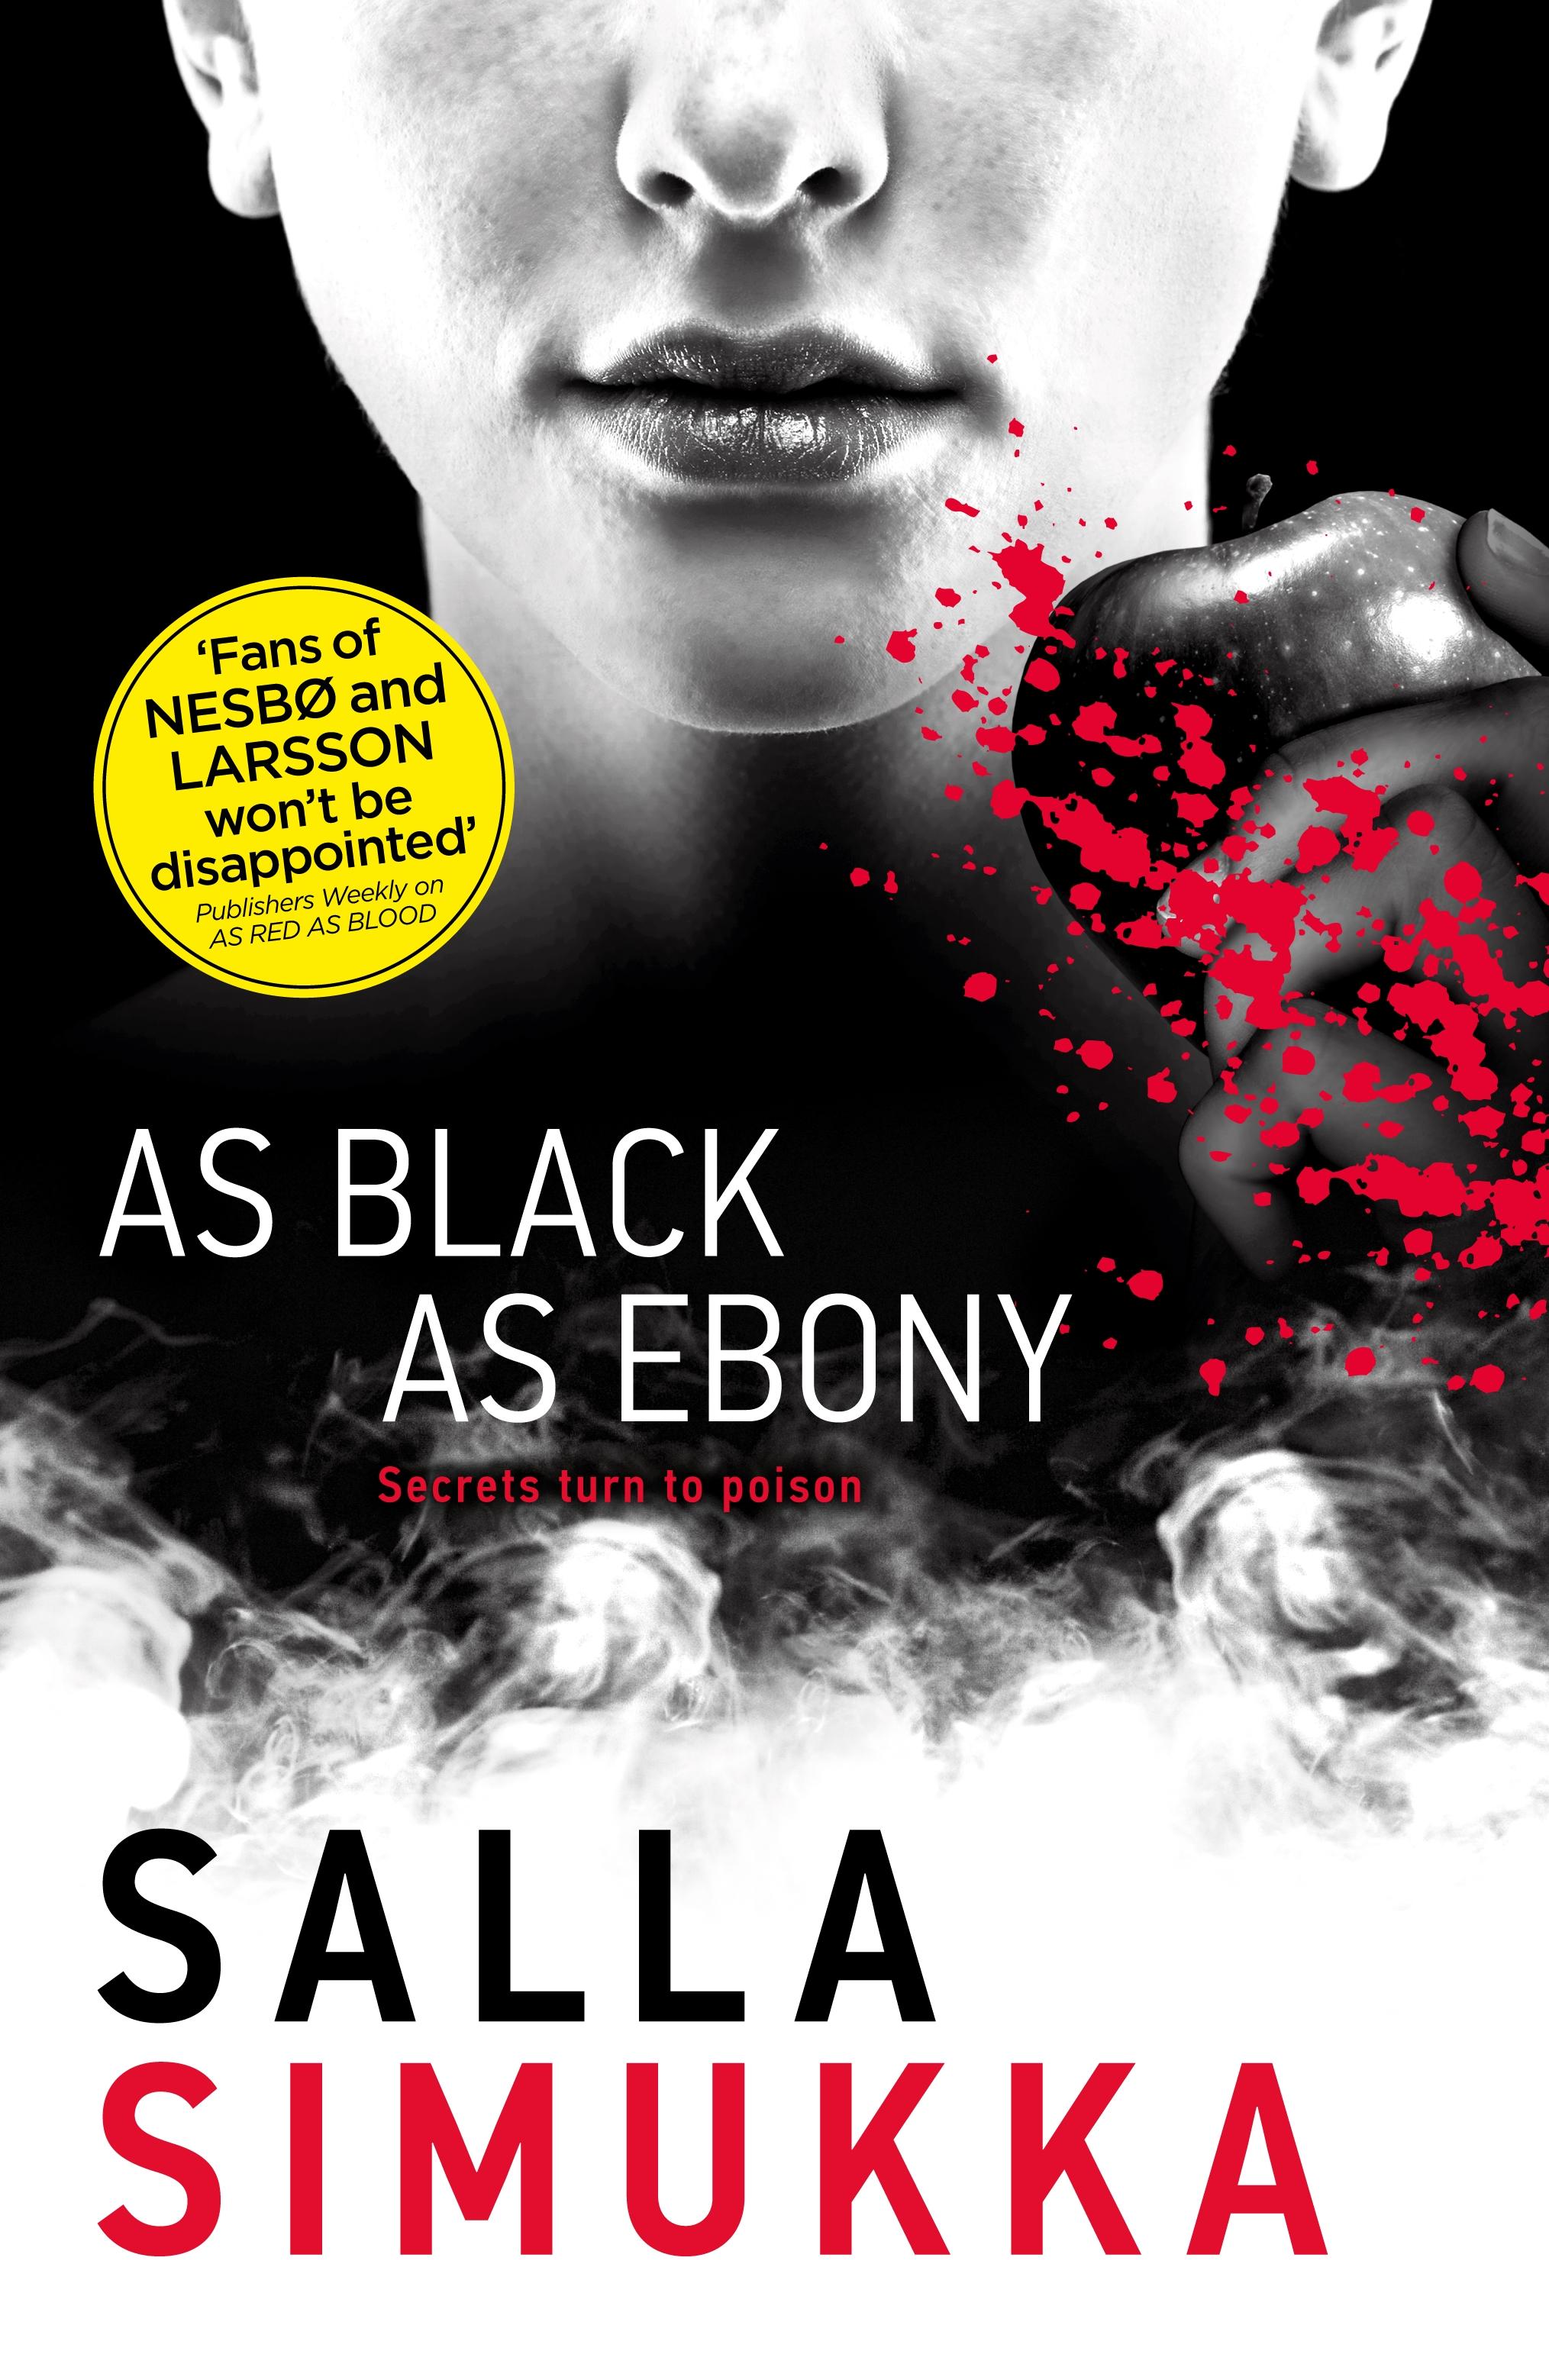 As Black as Ebony by Salla Simukka